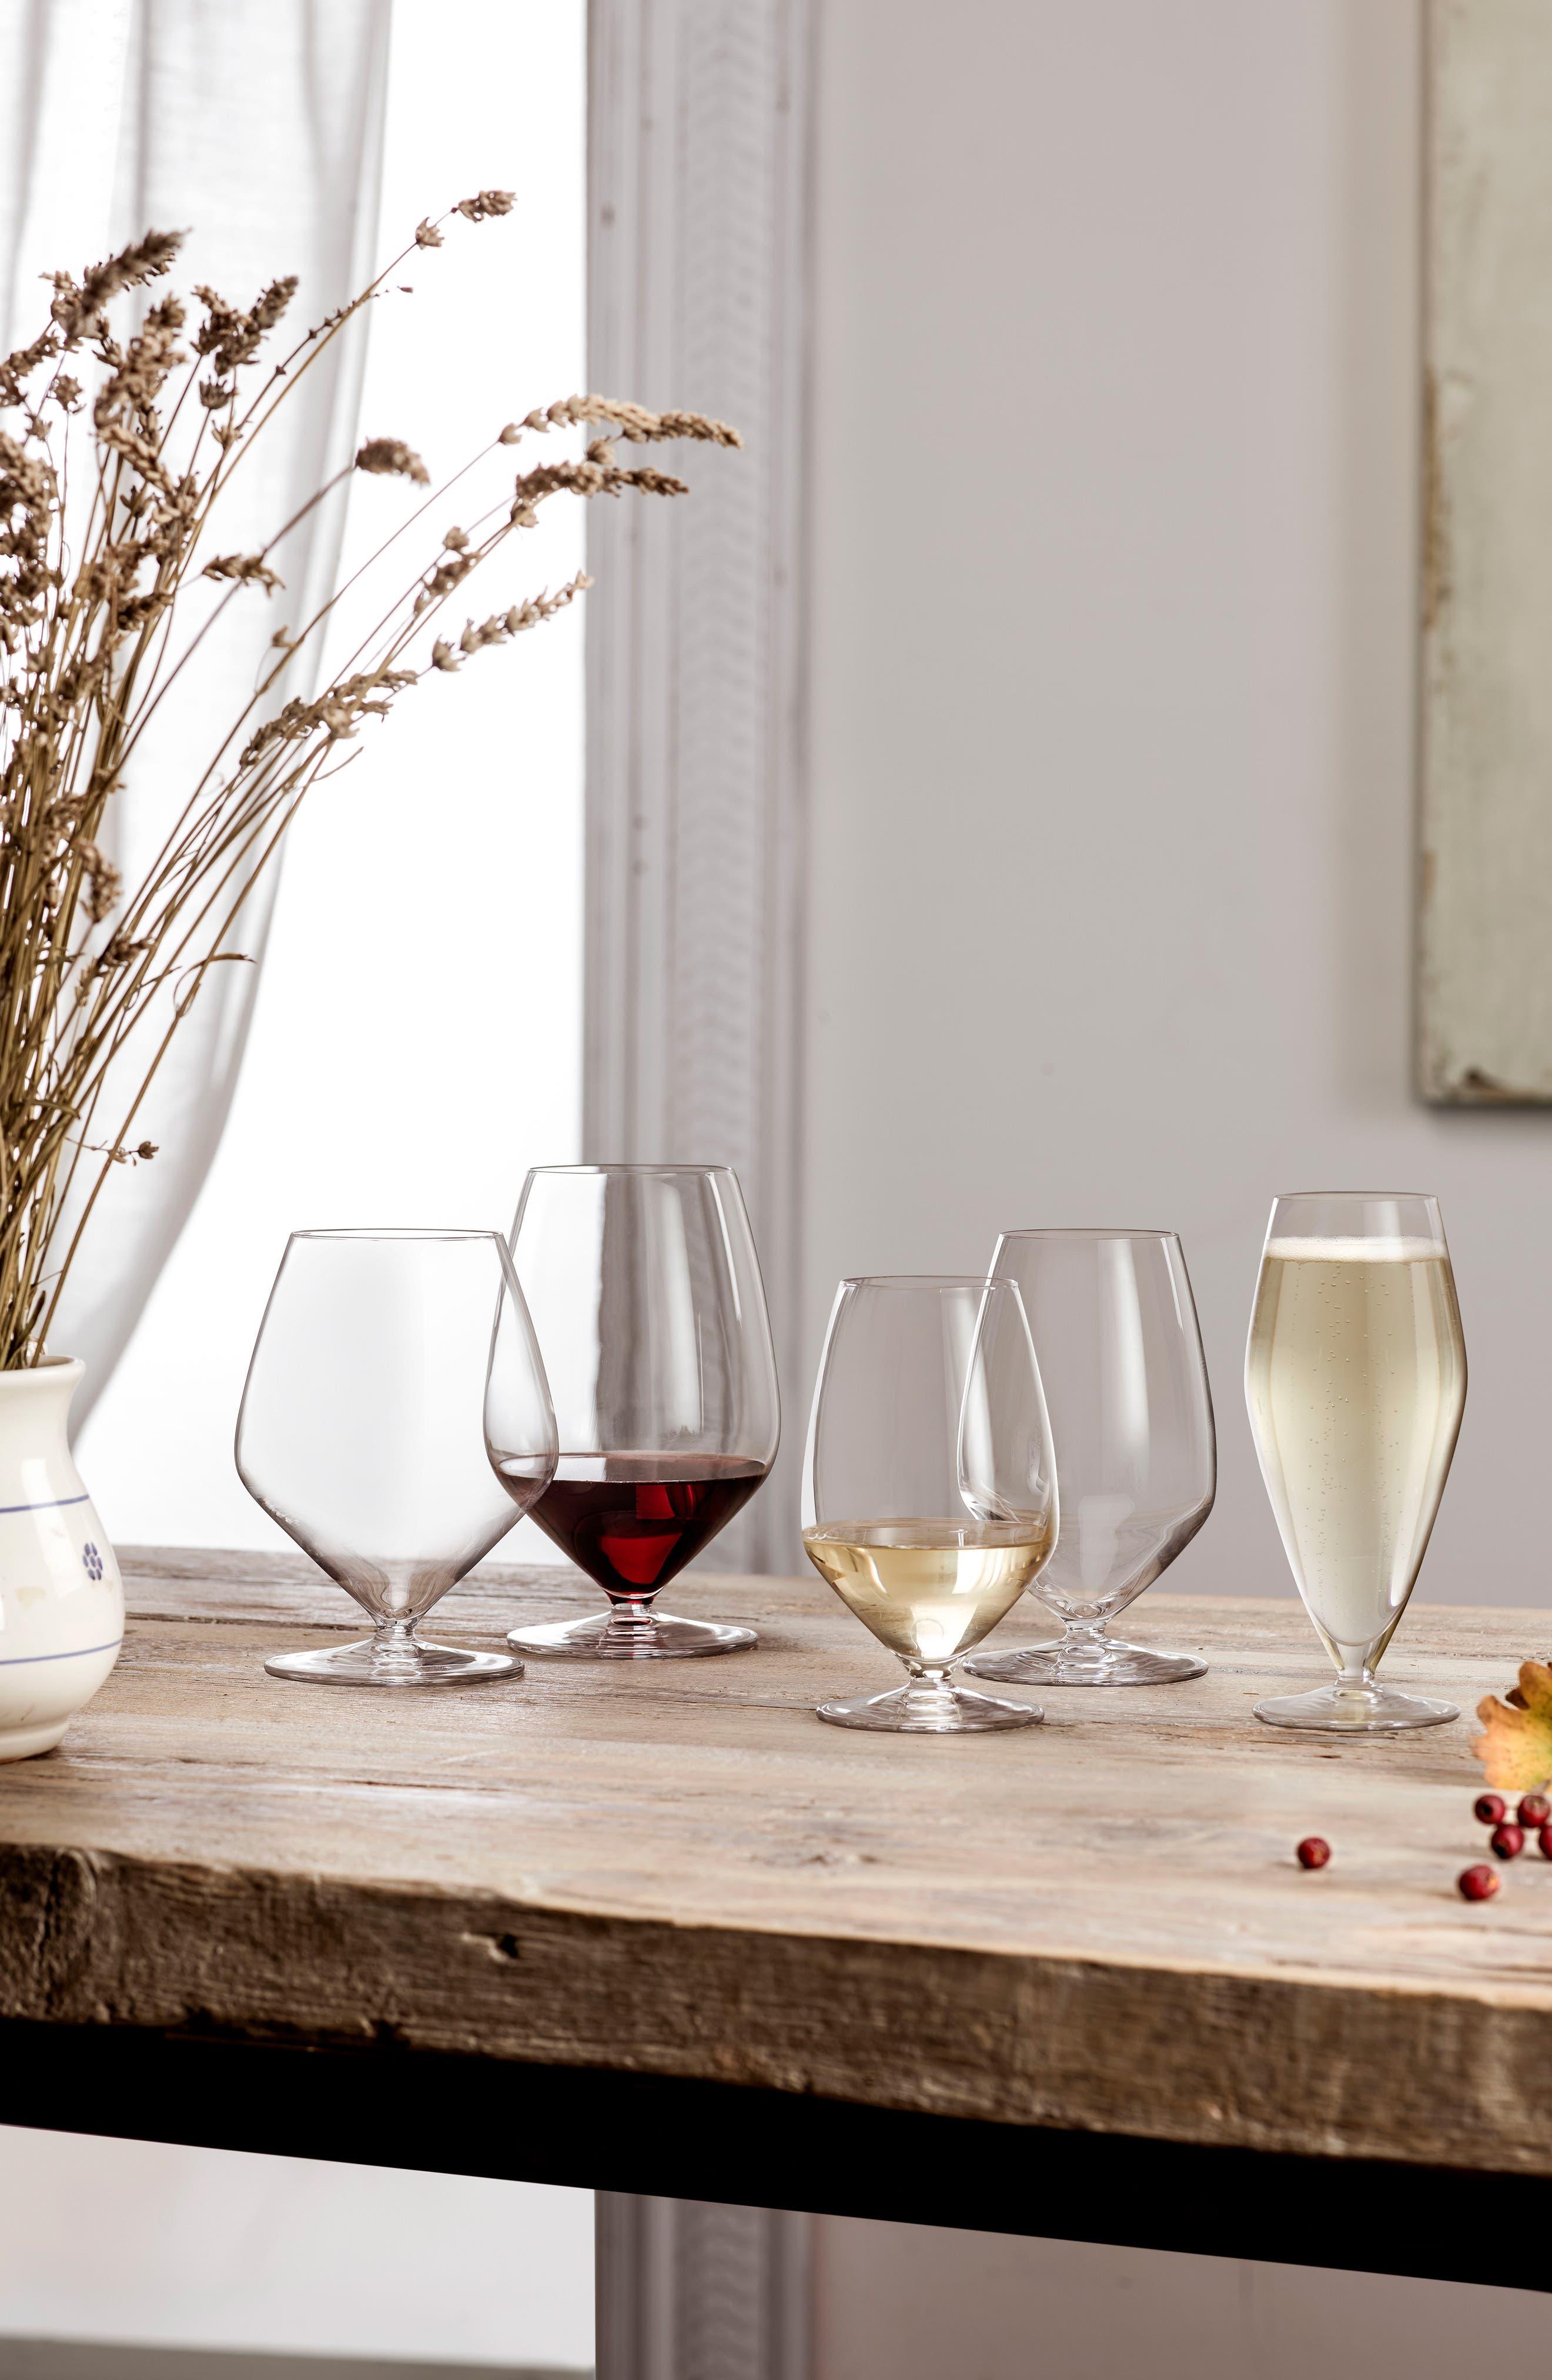 T-Glass Set of 4 Cabernet/Merlot Glasses,                             Alternate thumbnail 2, color,                             100